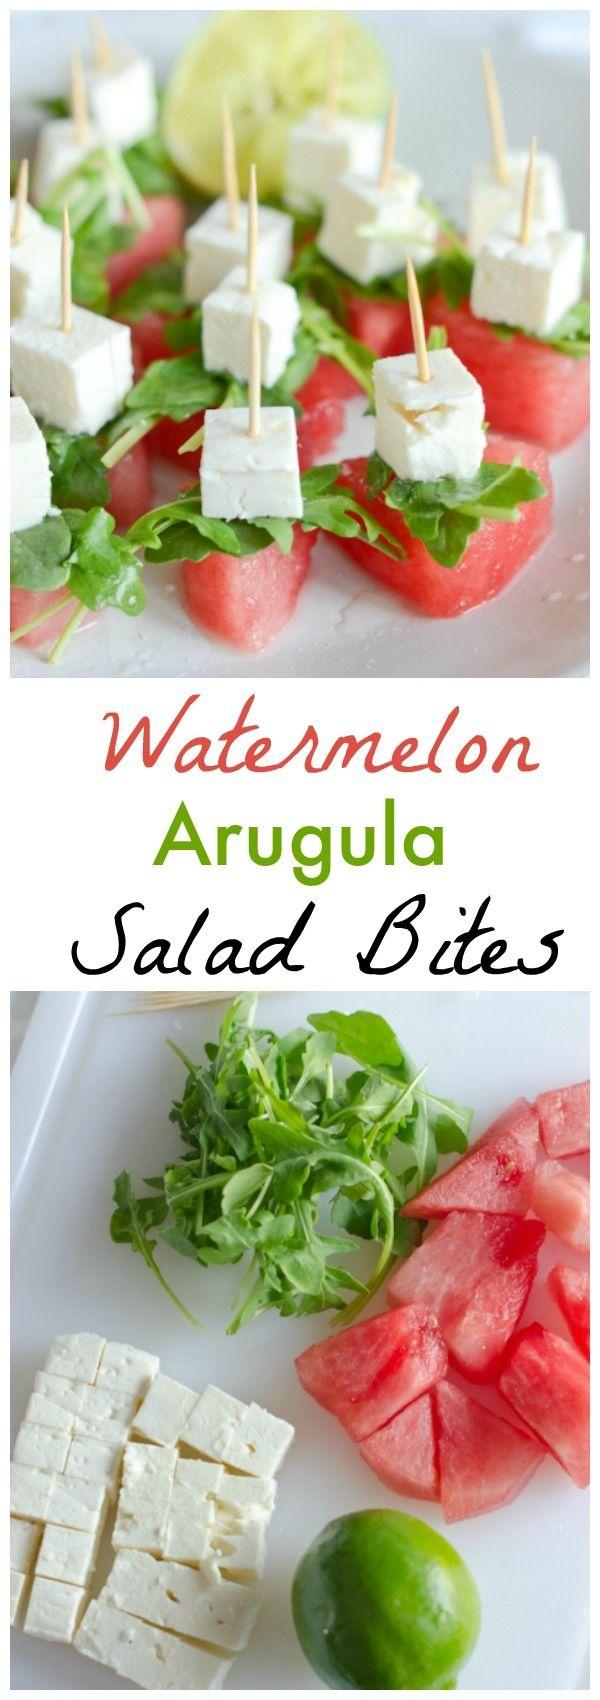 Watermelon Arugula Salad Bites Recipe | Healthy Appetizer